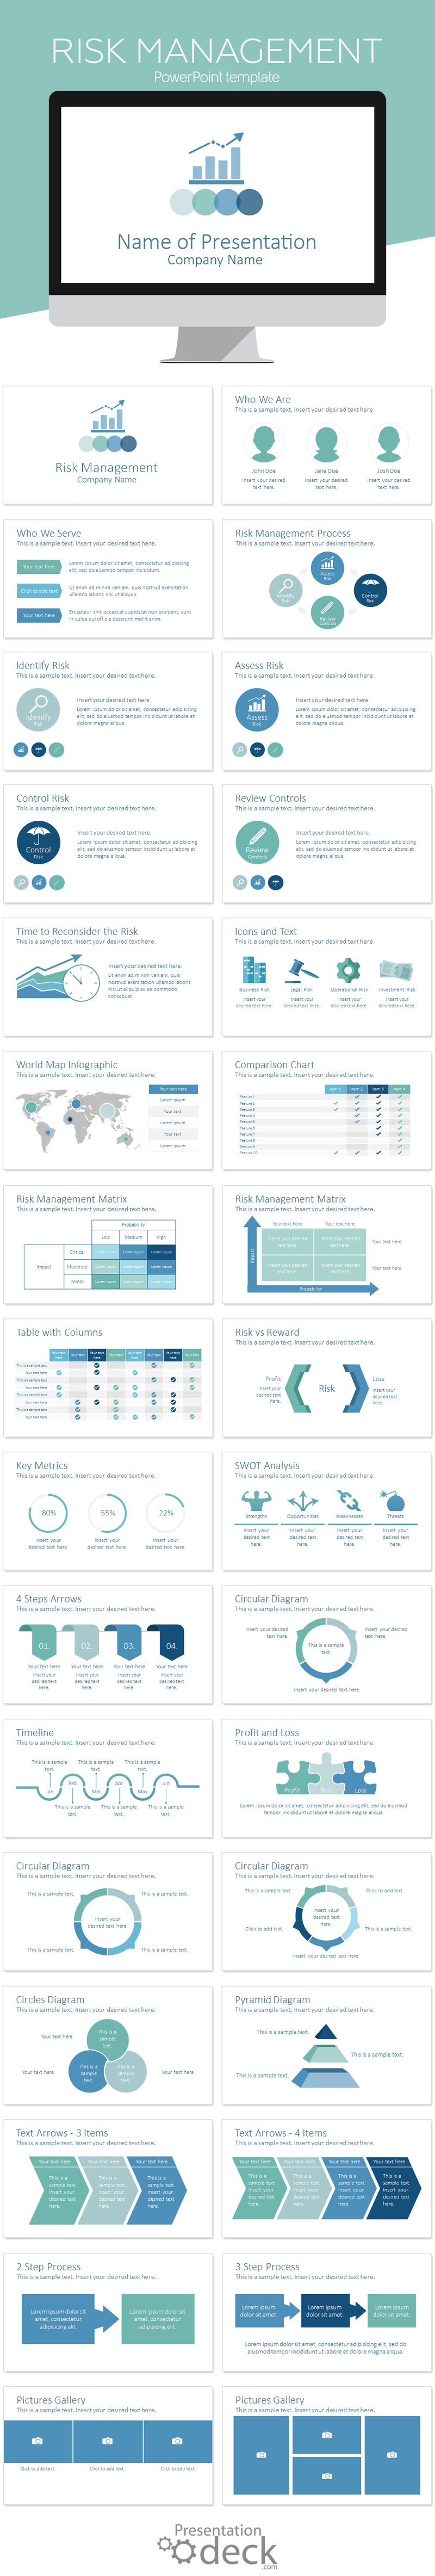 risk management powerpoint template | risk management, design, Presentation templates